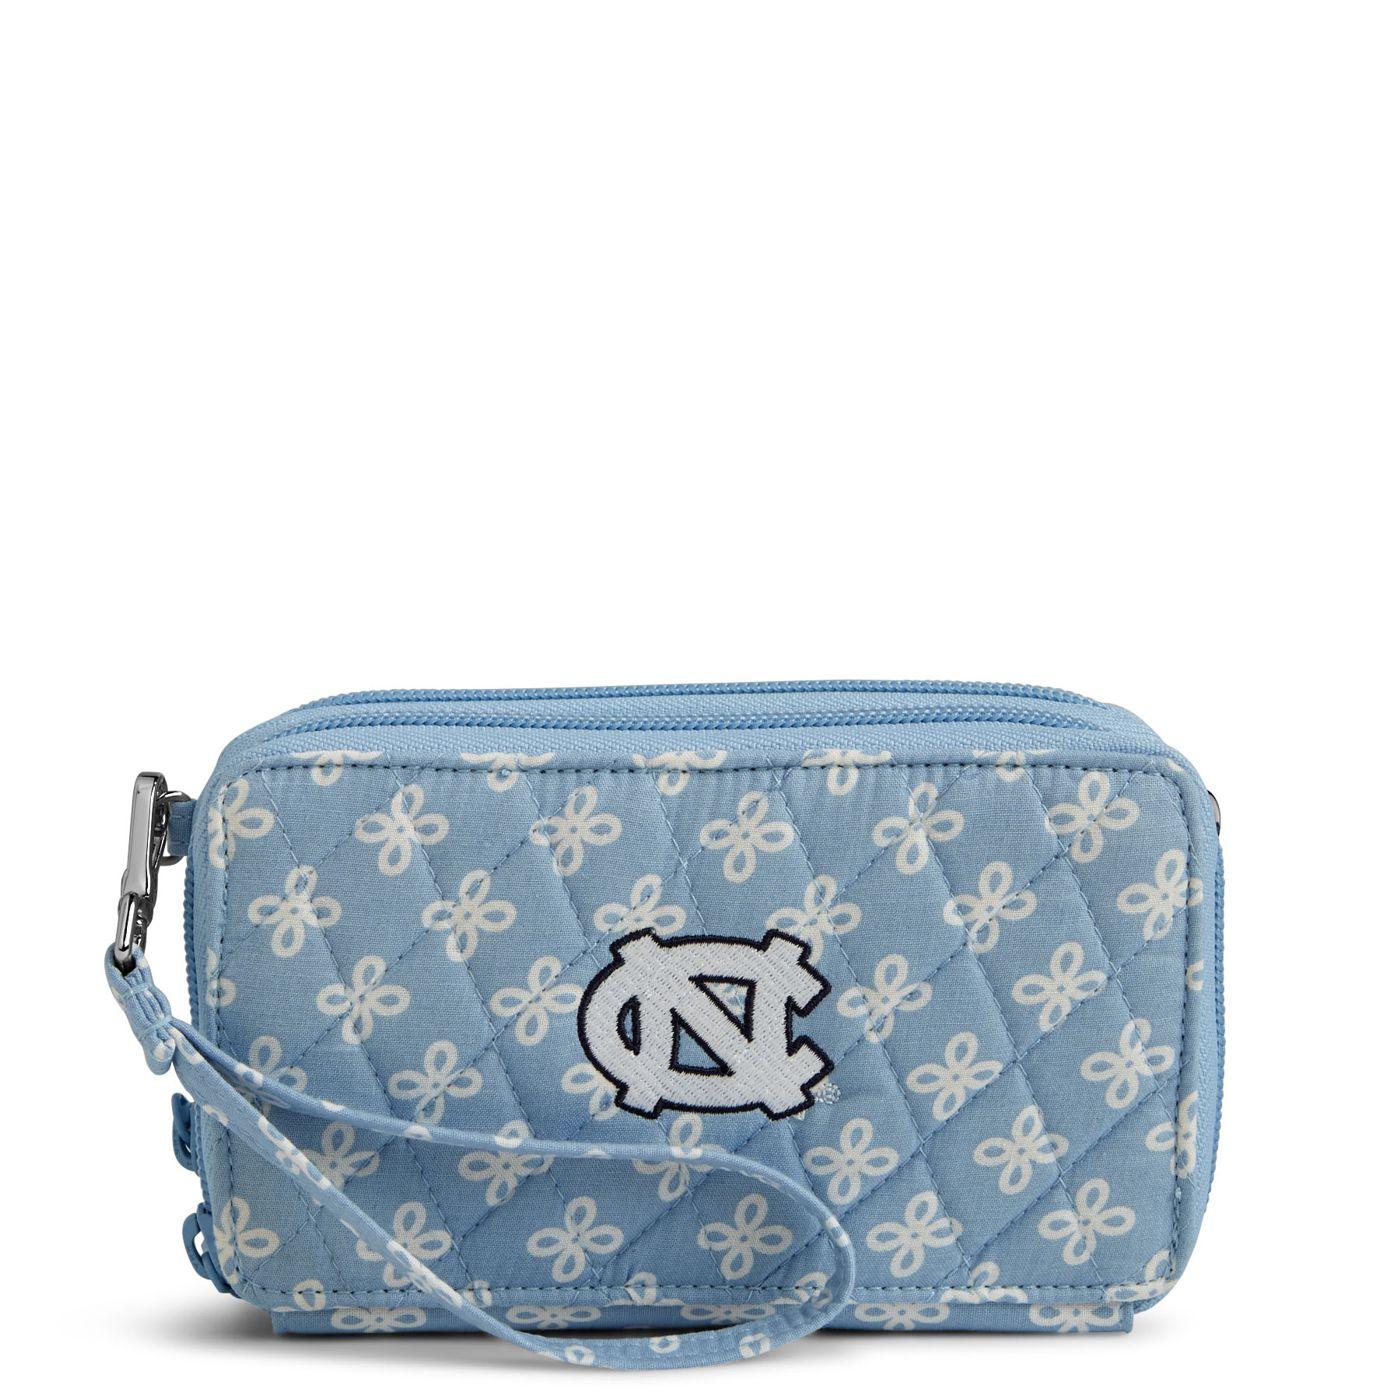 4564ecd045 Johnny T-shirt - North Carolina Tar Heels - Vera Bradley All In One  Crossbody Bag by Vera Bradley